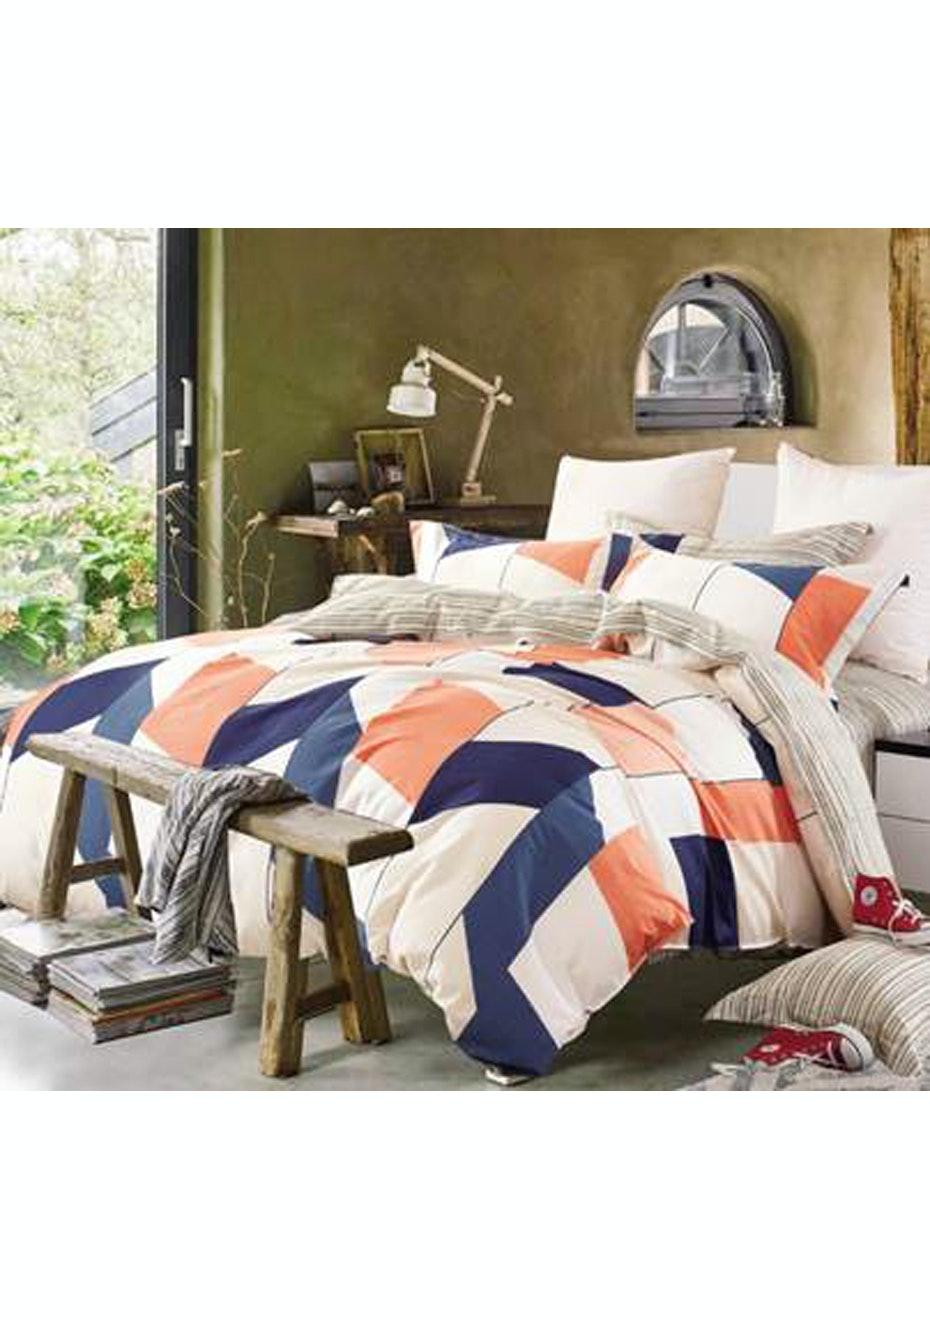 Isla Quilt Cover Set - Reversible Design - 100% Cotton -  Double Bed